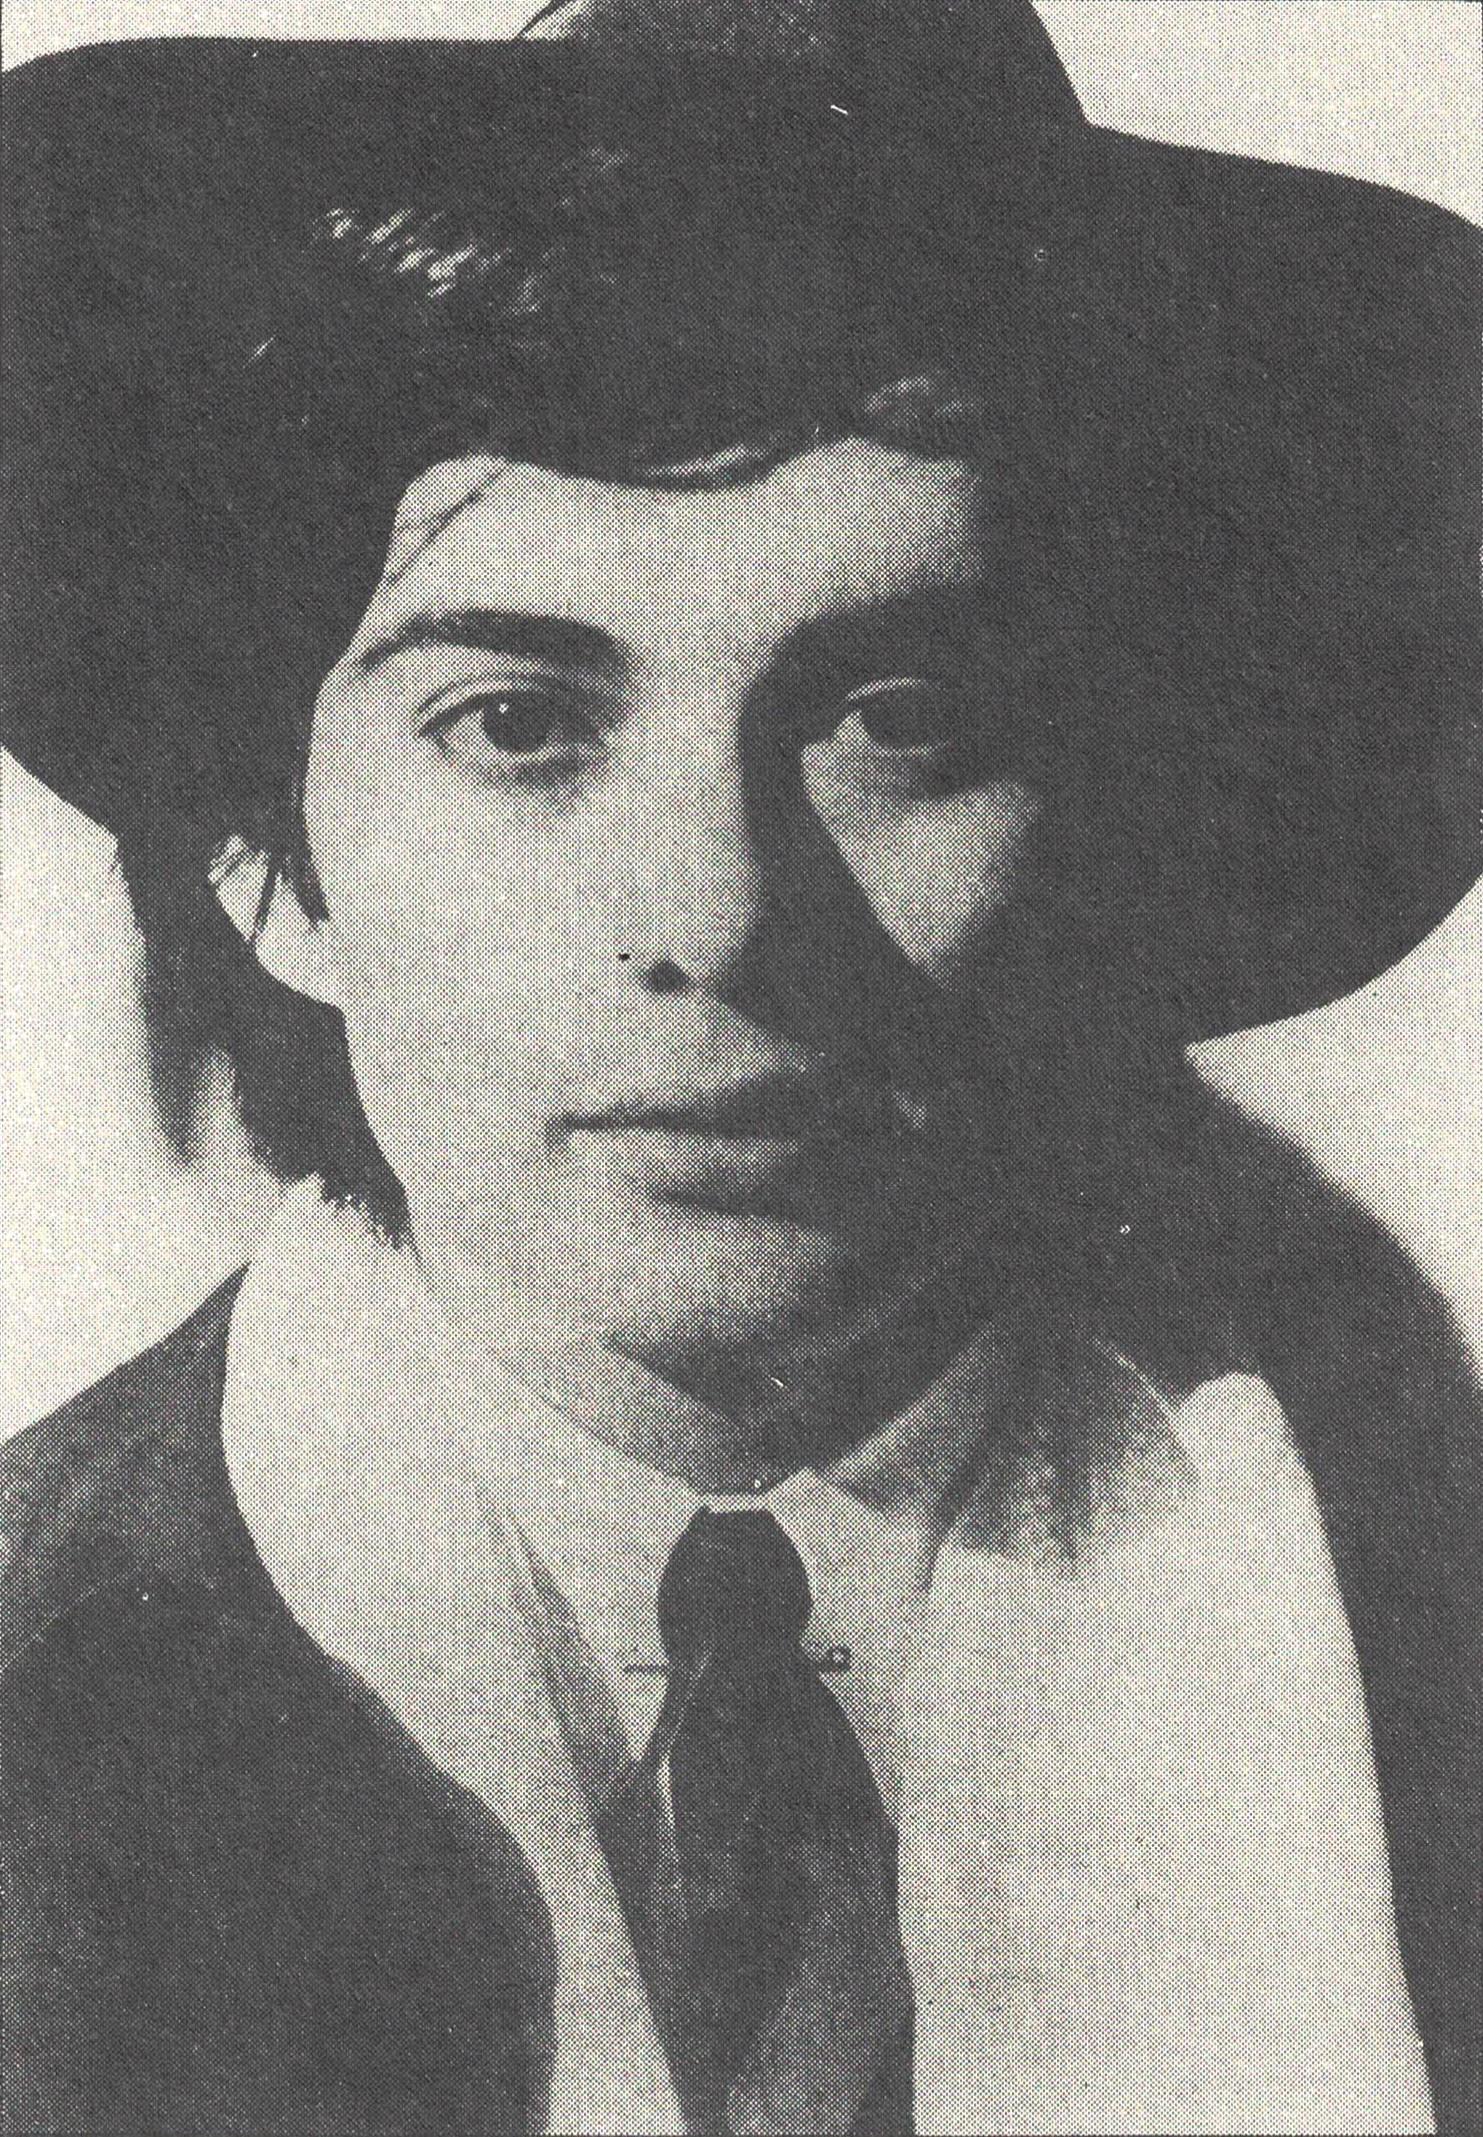 Figura 6. Roma de Fellini: Peter Gonzales, no papel de Fellini aos 18 anos